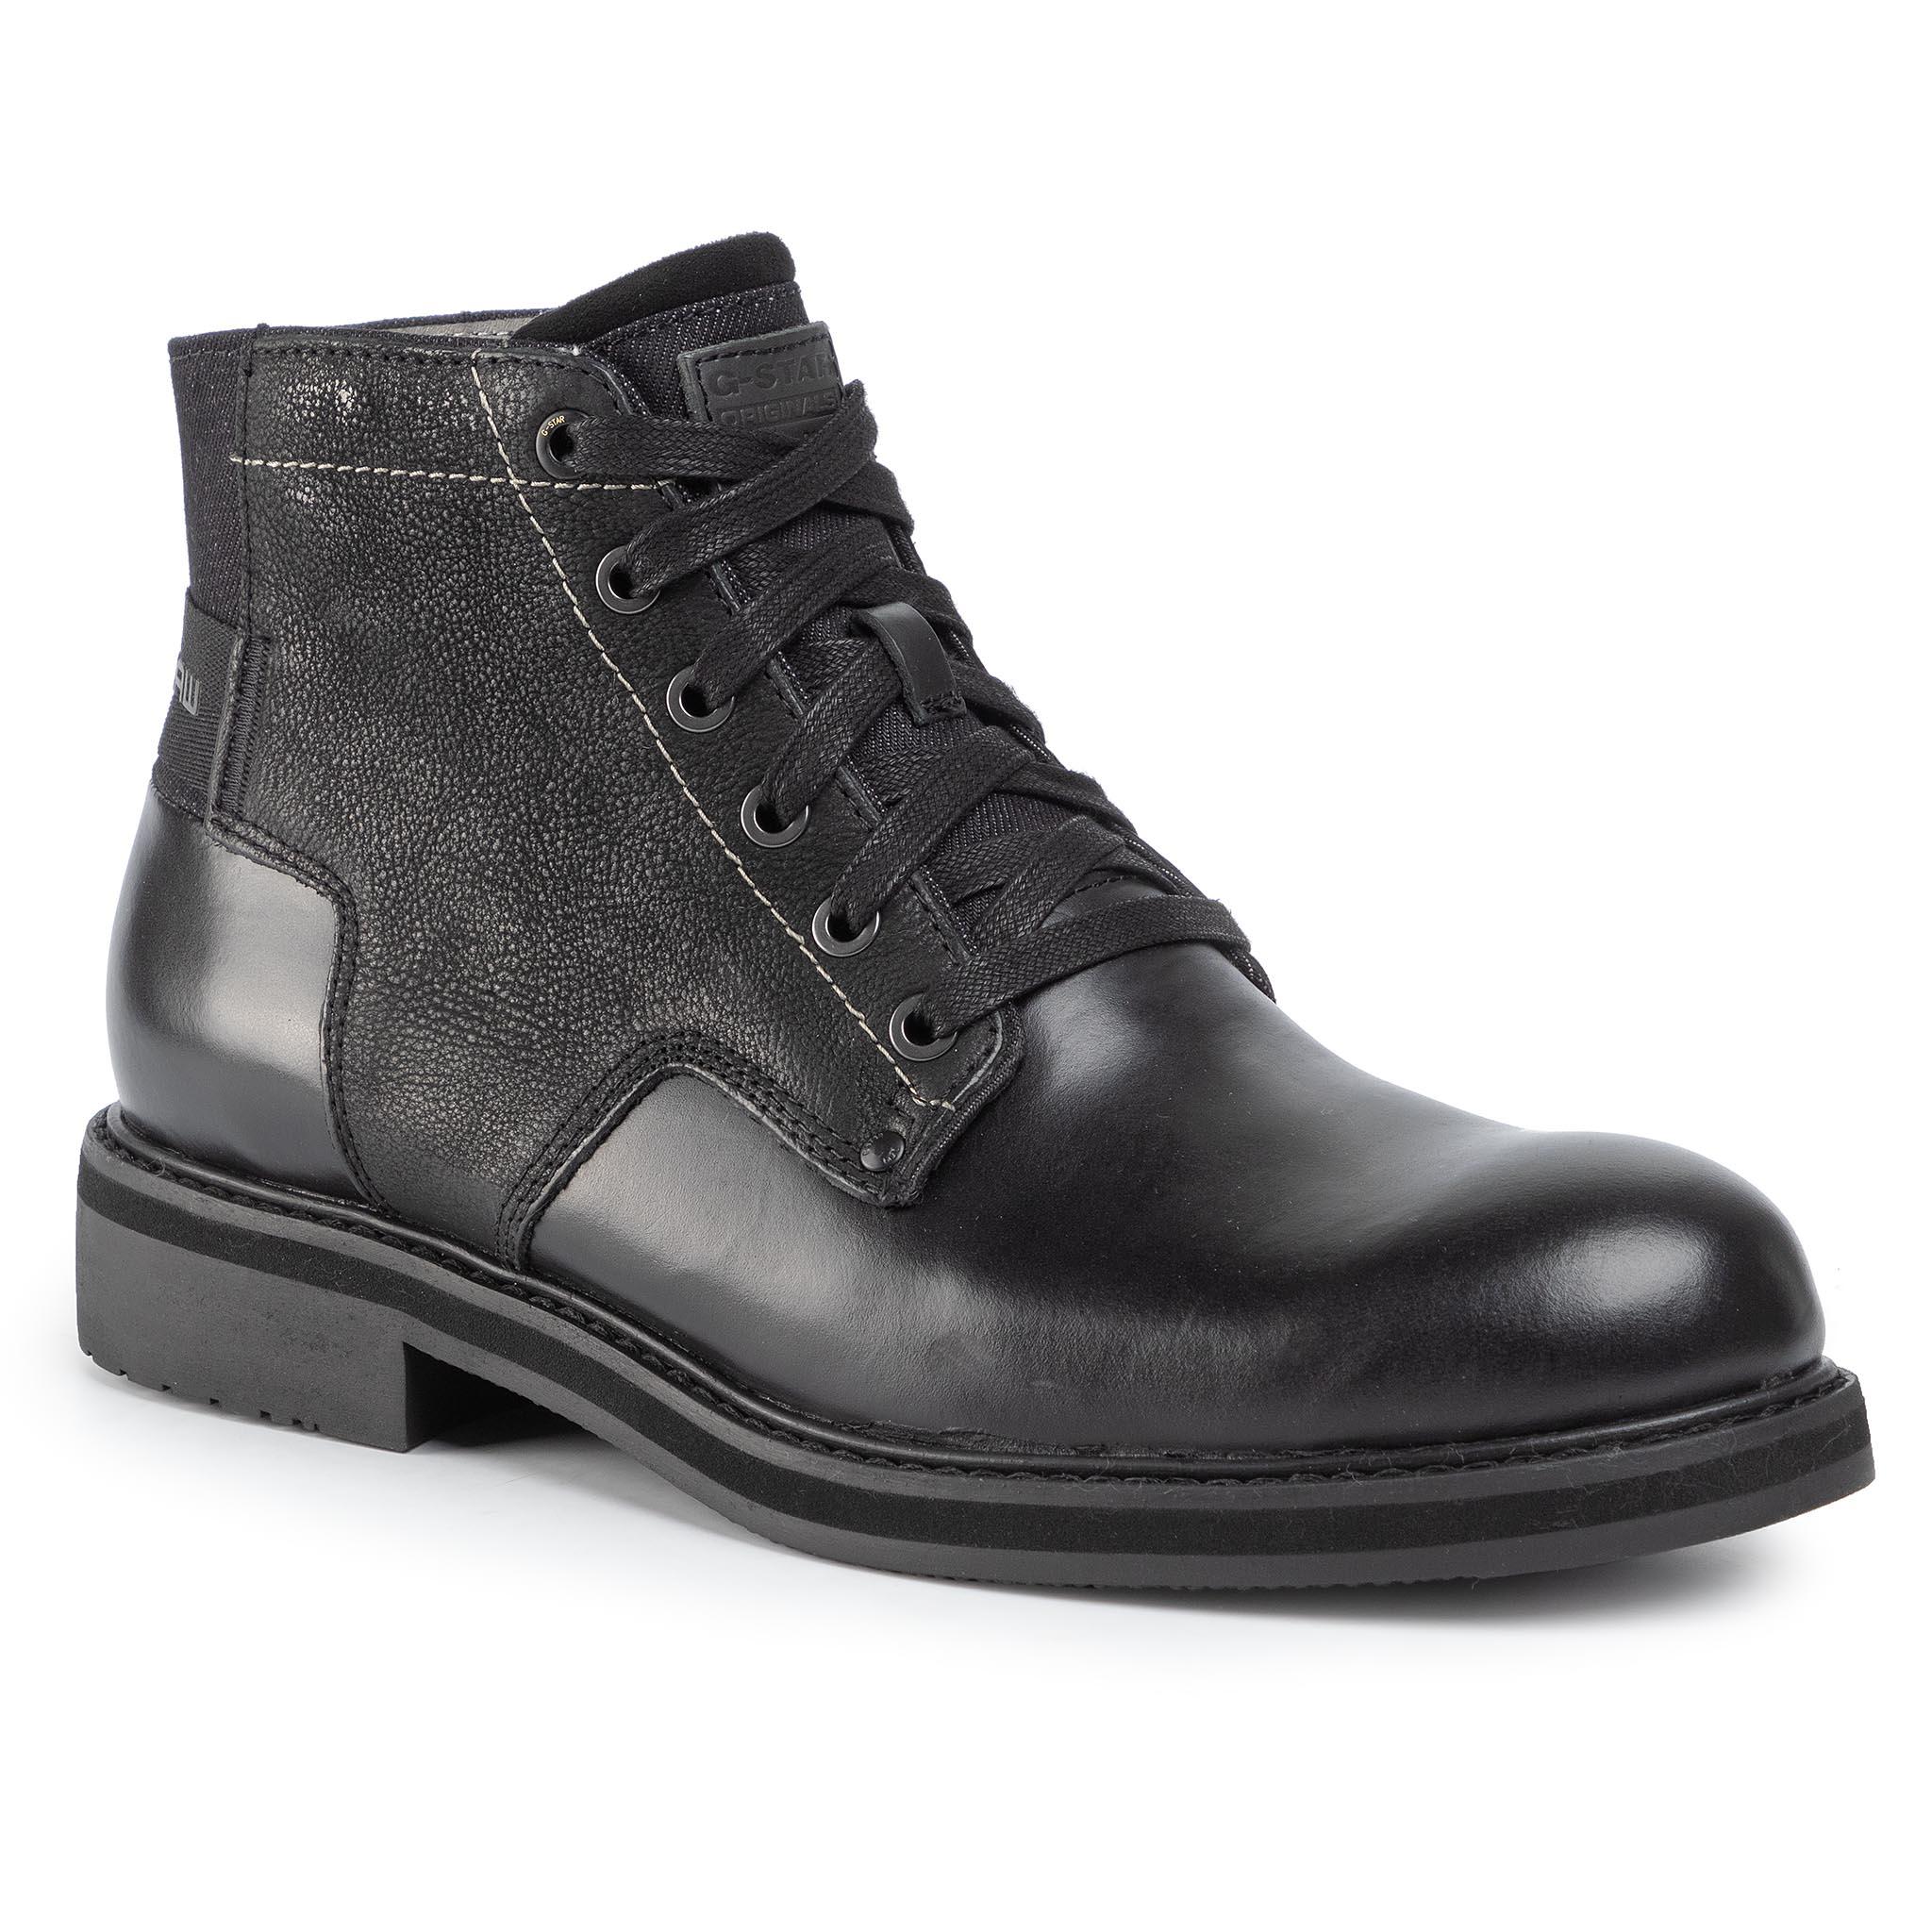 Outdoorová obuv G-STAR RAW - Garber D14039-098-990 Black